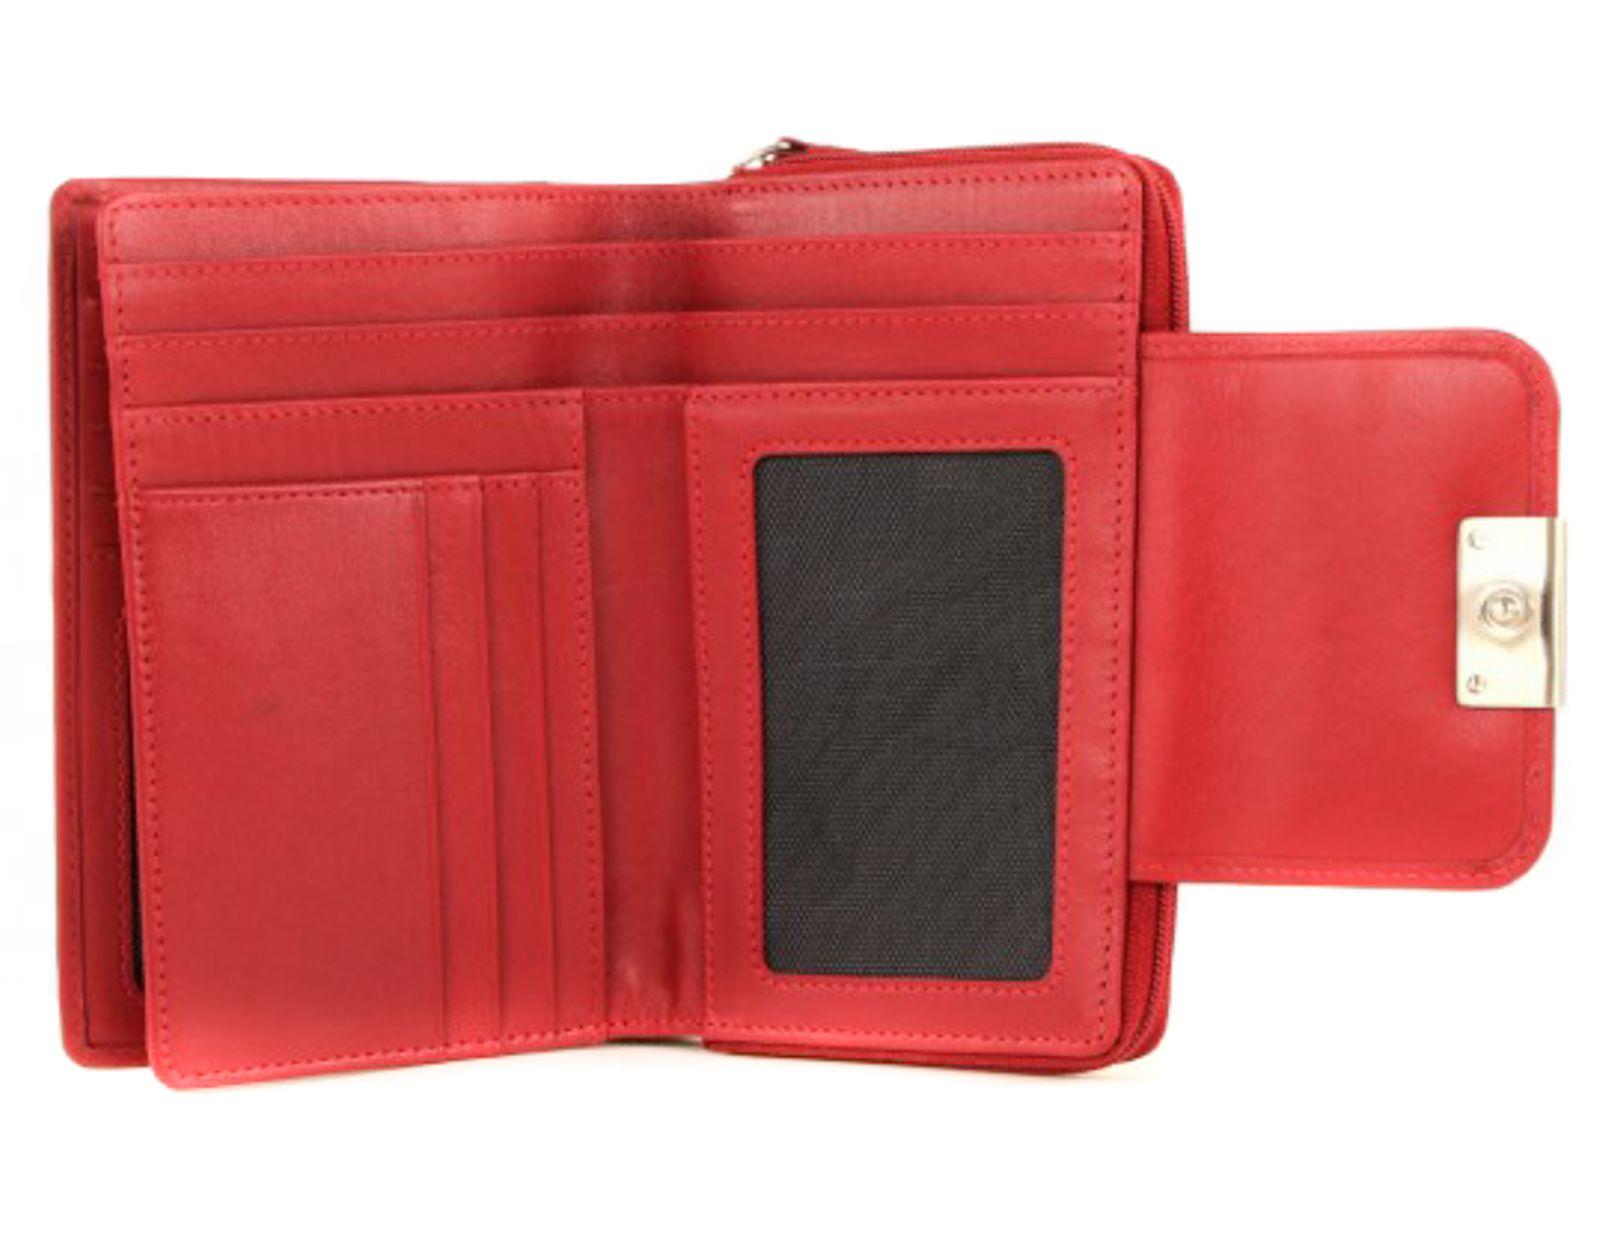 Maitre Helena Damenbörse Portemonnaie Geldbörse Geldbeutel Rot Red Leder Neu